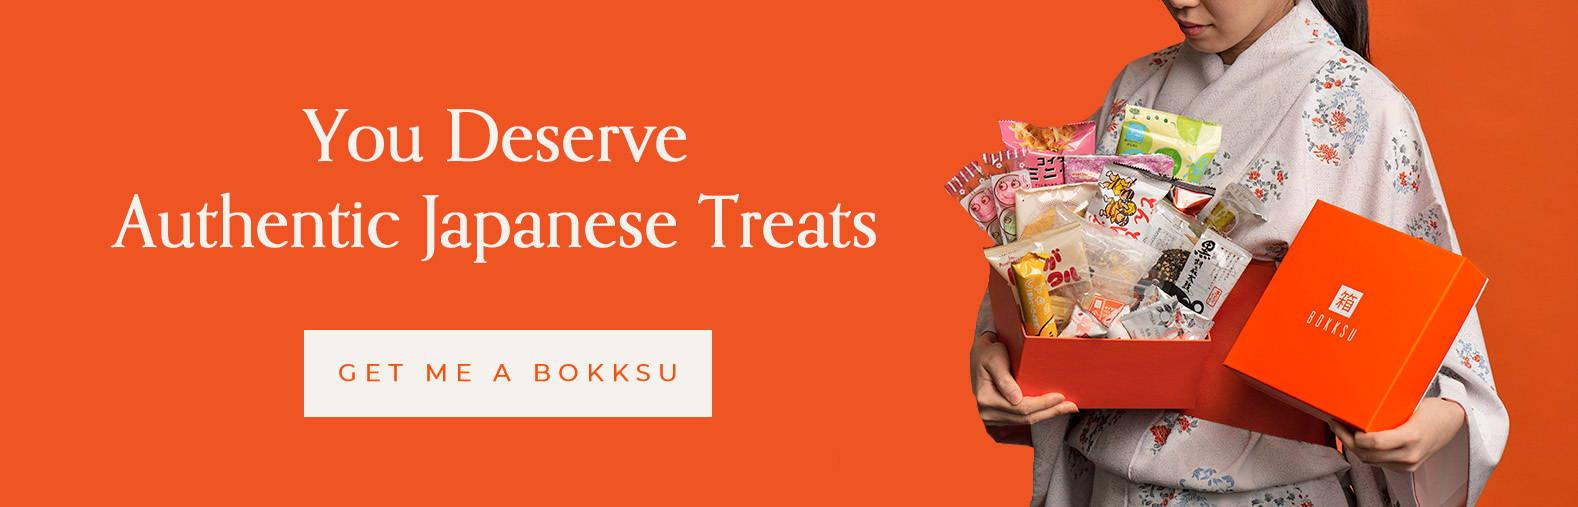 subscribe to Bokksu Japanese snack subscription box